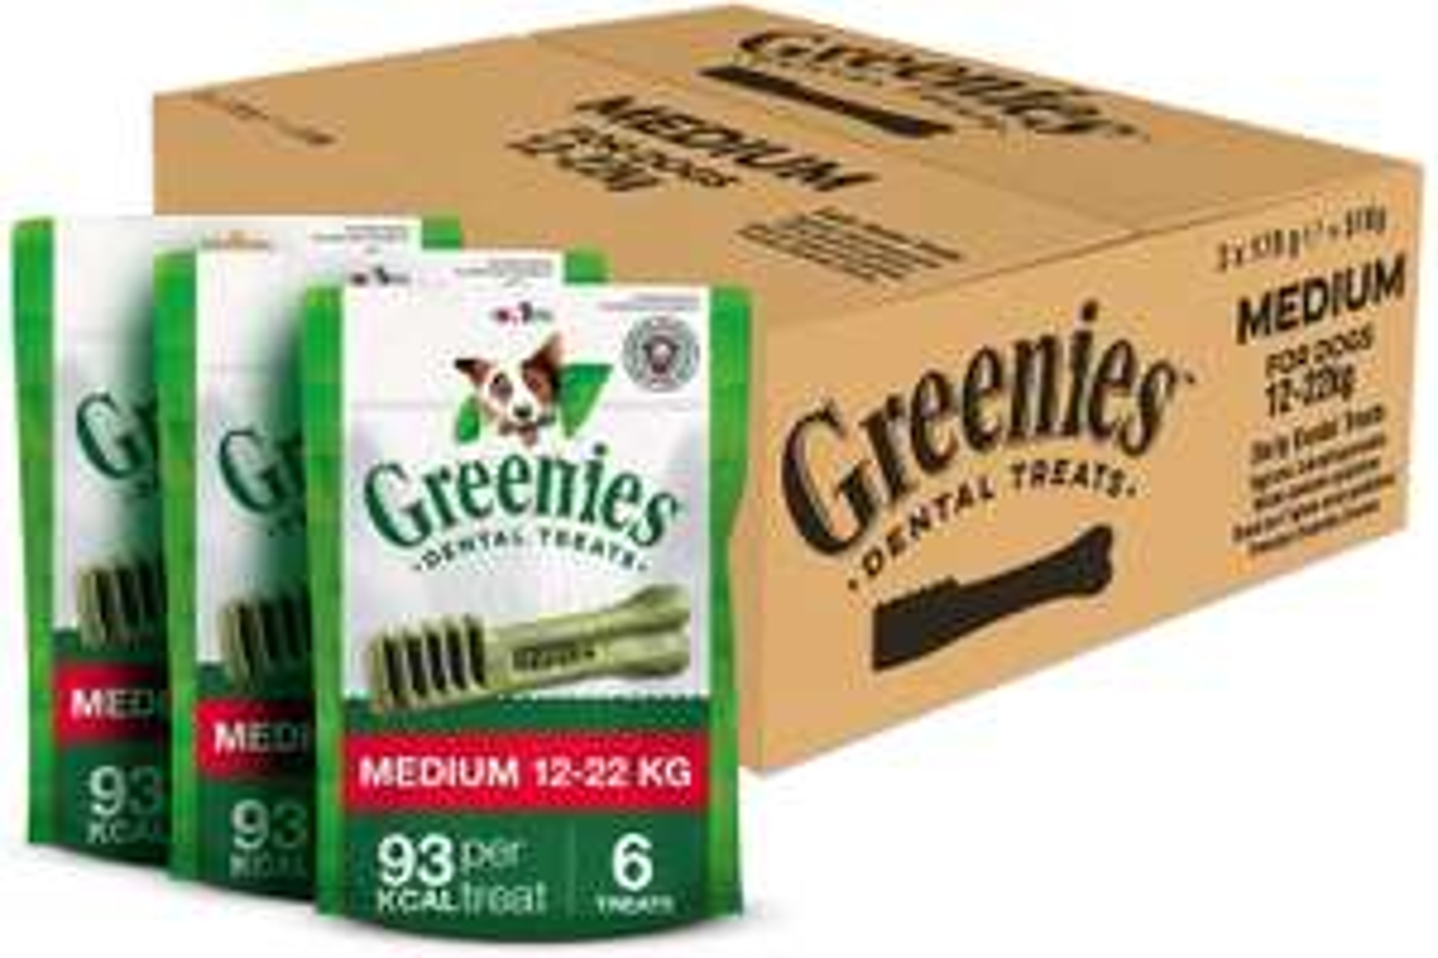 Greenies Daily Original Medium Dog Treats - 18 Chews (3 x 170 g) £10.46 (£6.27 S&S wth voucher) + £4.49 NP @ Amazon